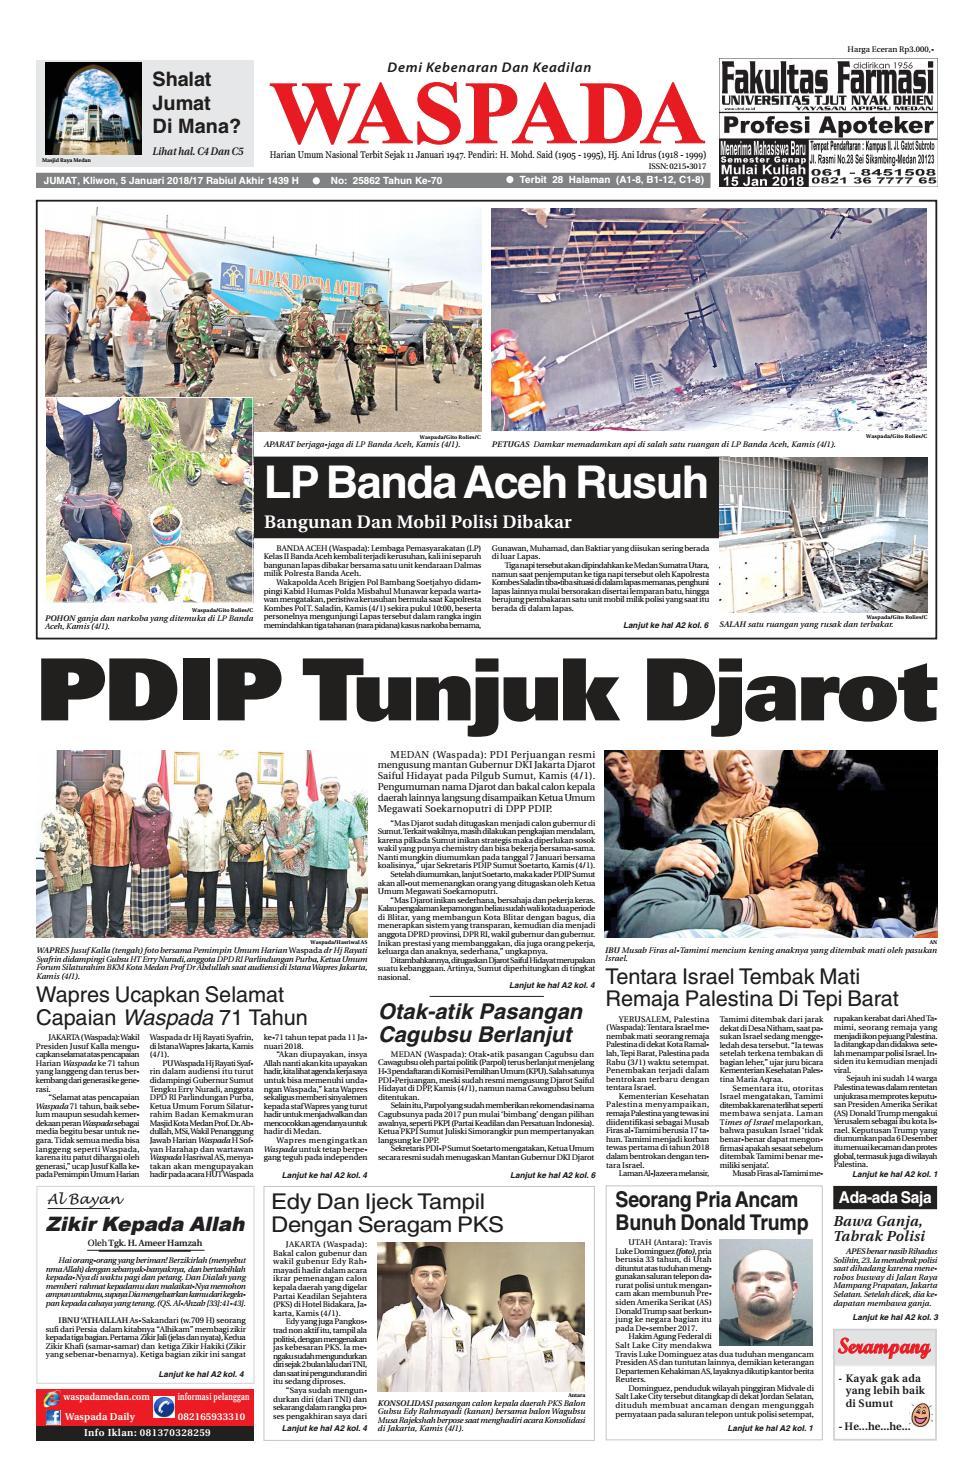 Waspada jumat 05 januari 2018 by Harian Waspada issuu